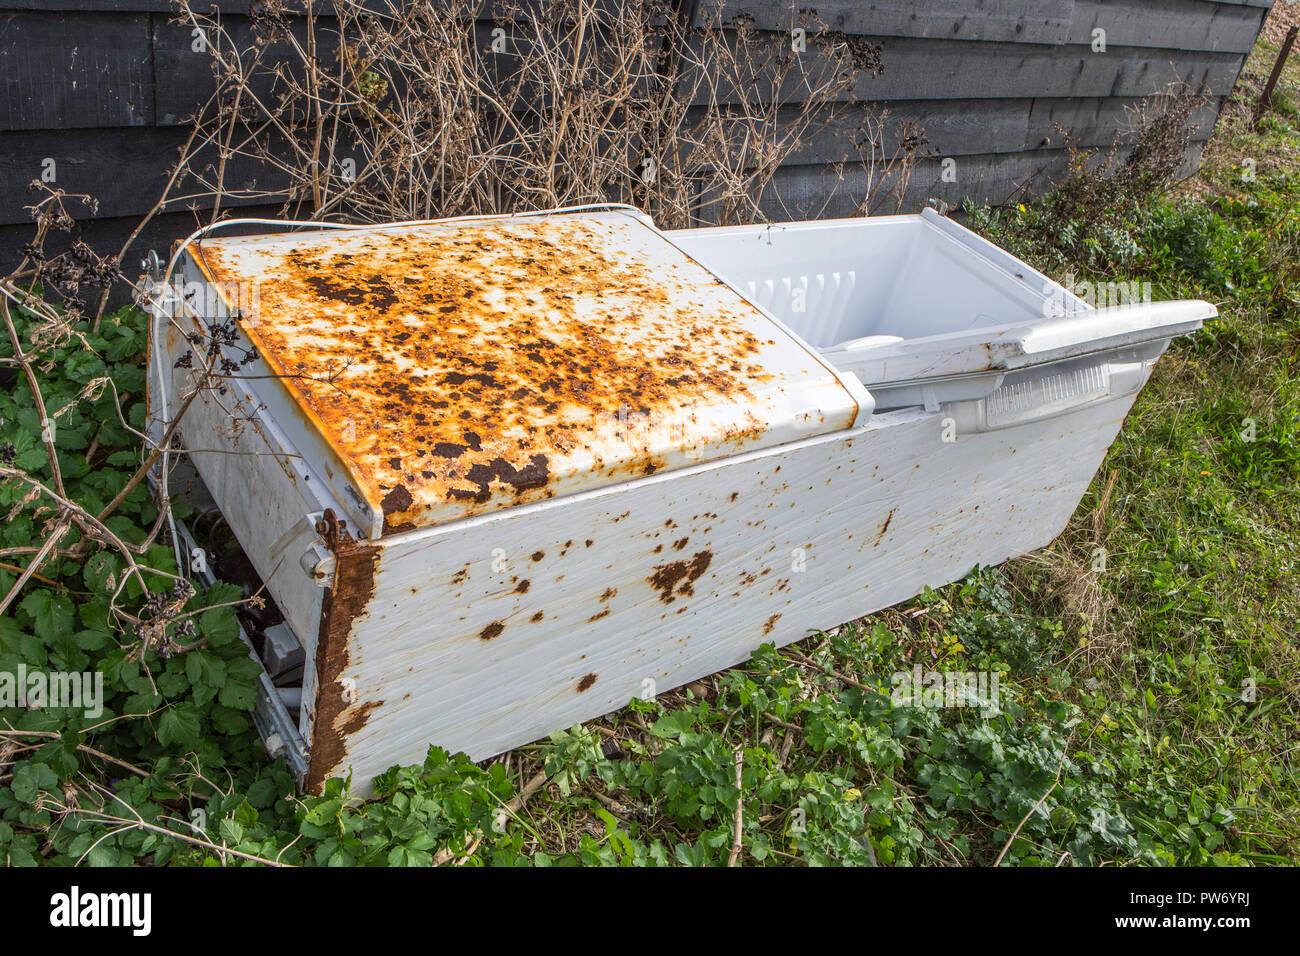 Un scartato frigo/freezer Immagini Stock